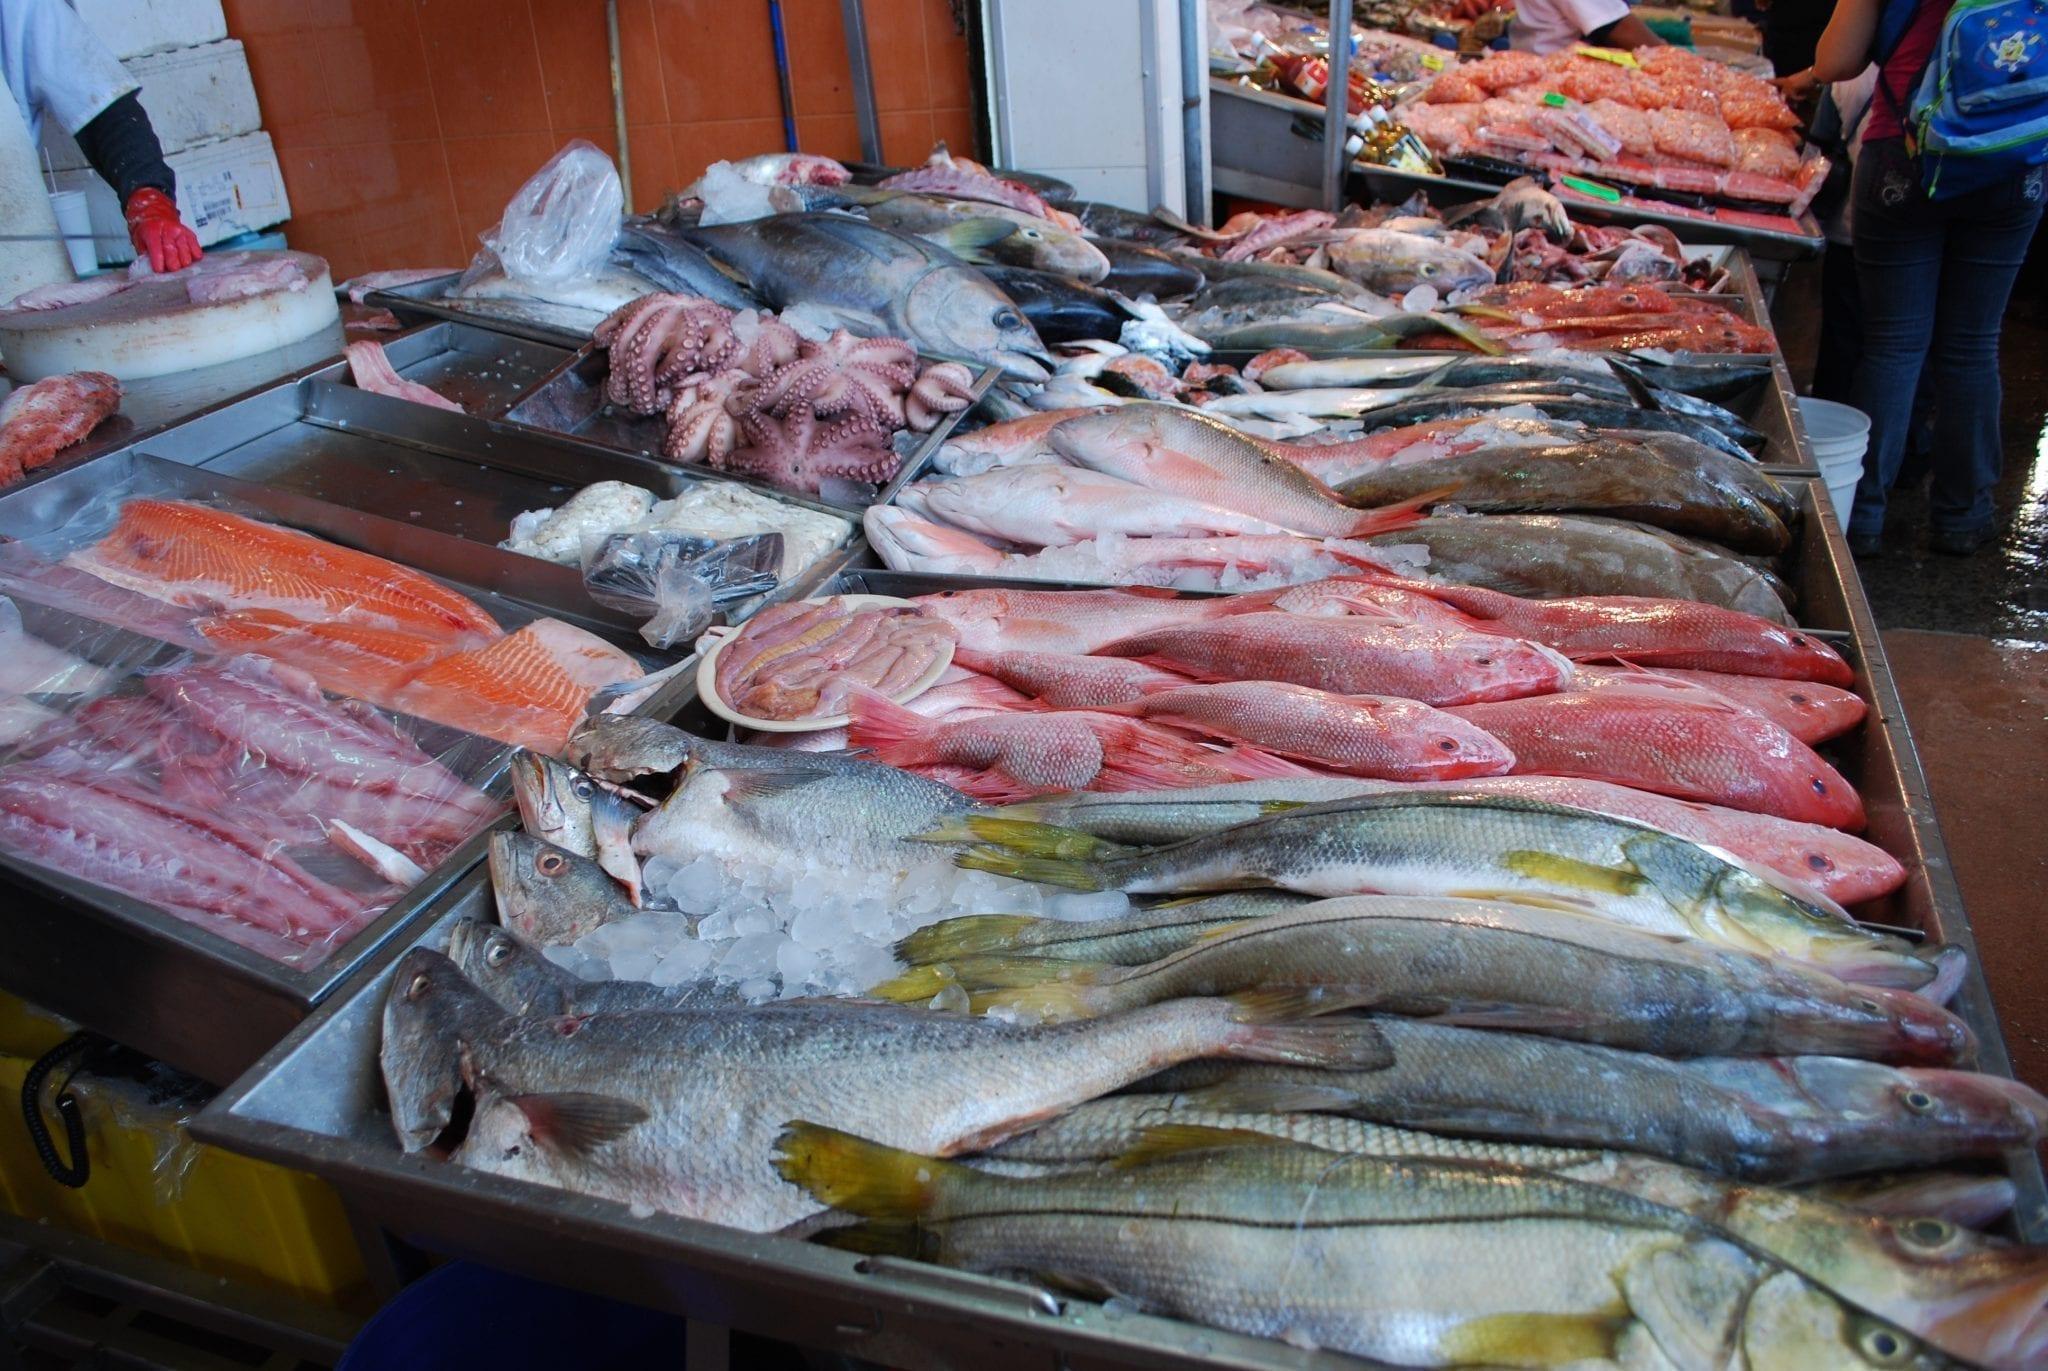 Fish for sale at La Nueva Viga Market in Mexico City; By AlejandroLinaresGarcia (Own work), CC BY-SA 4.0, via Wikimedia Commons, no changes.